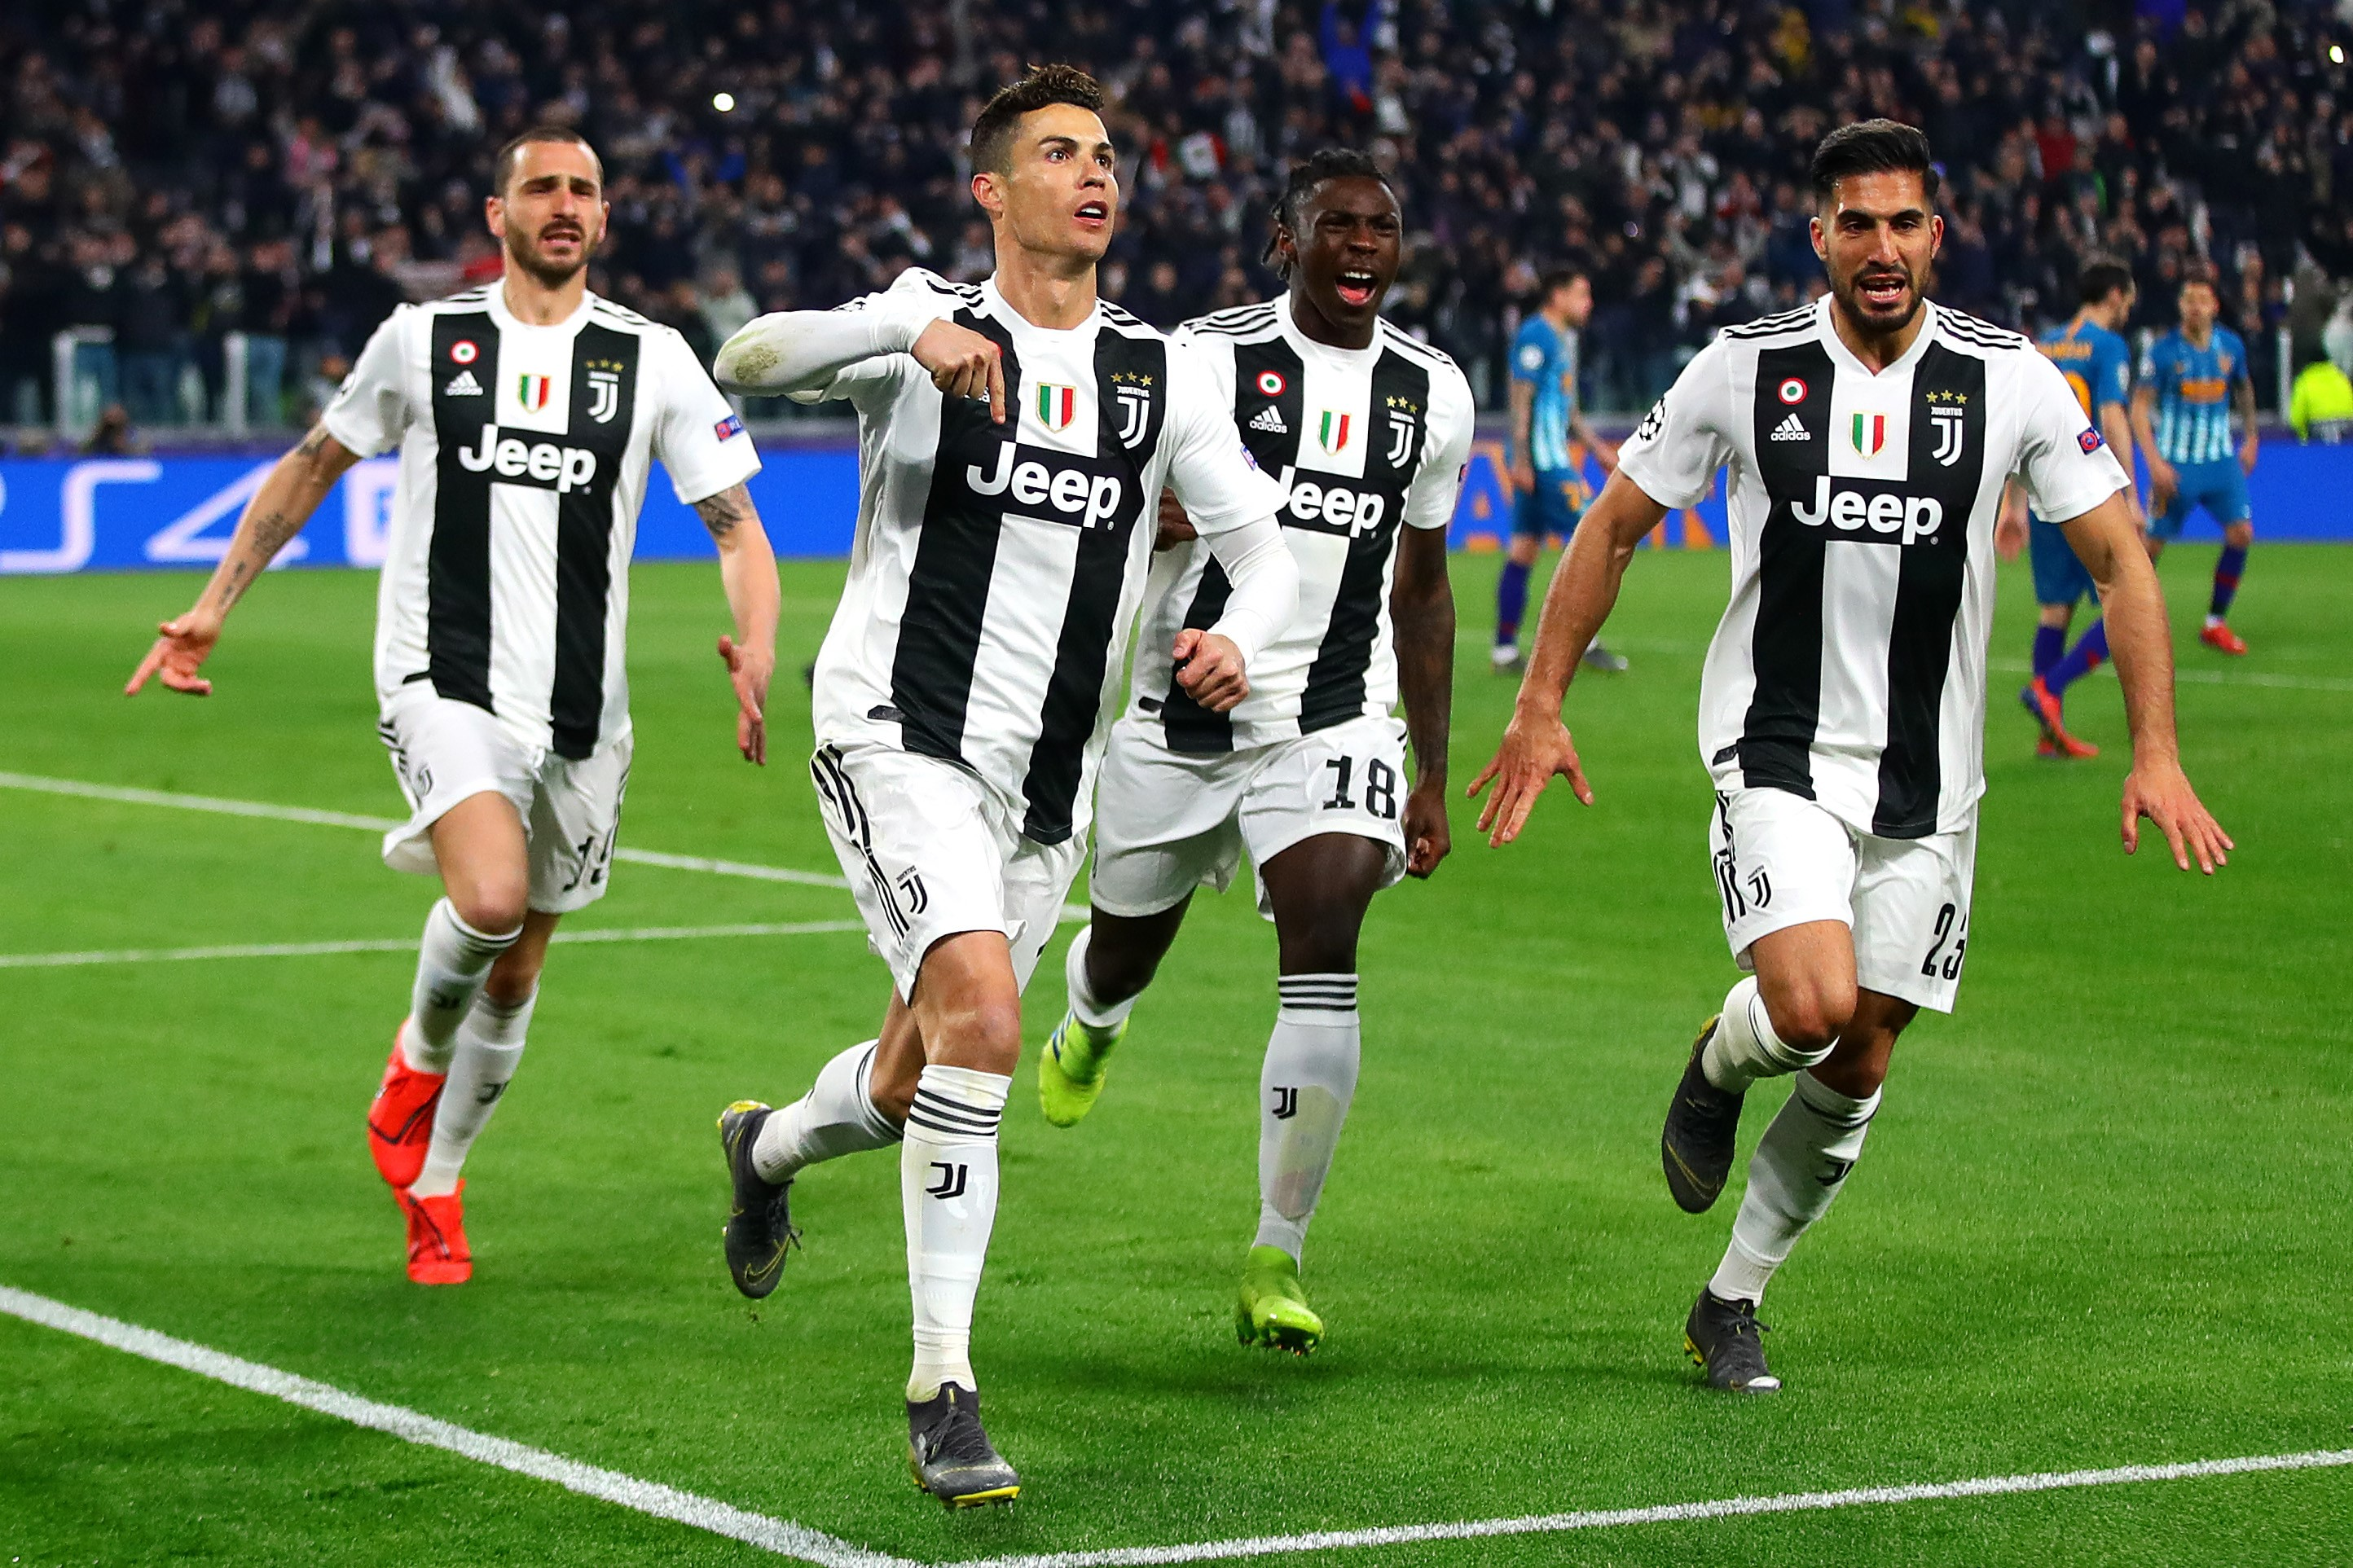 Cristiano Ronaldo célèbre face à l'Atlético Madrid